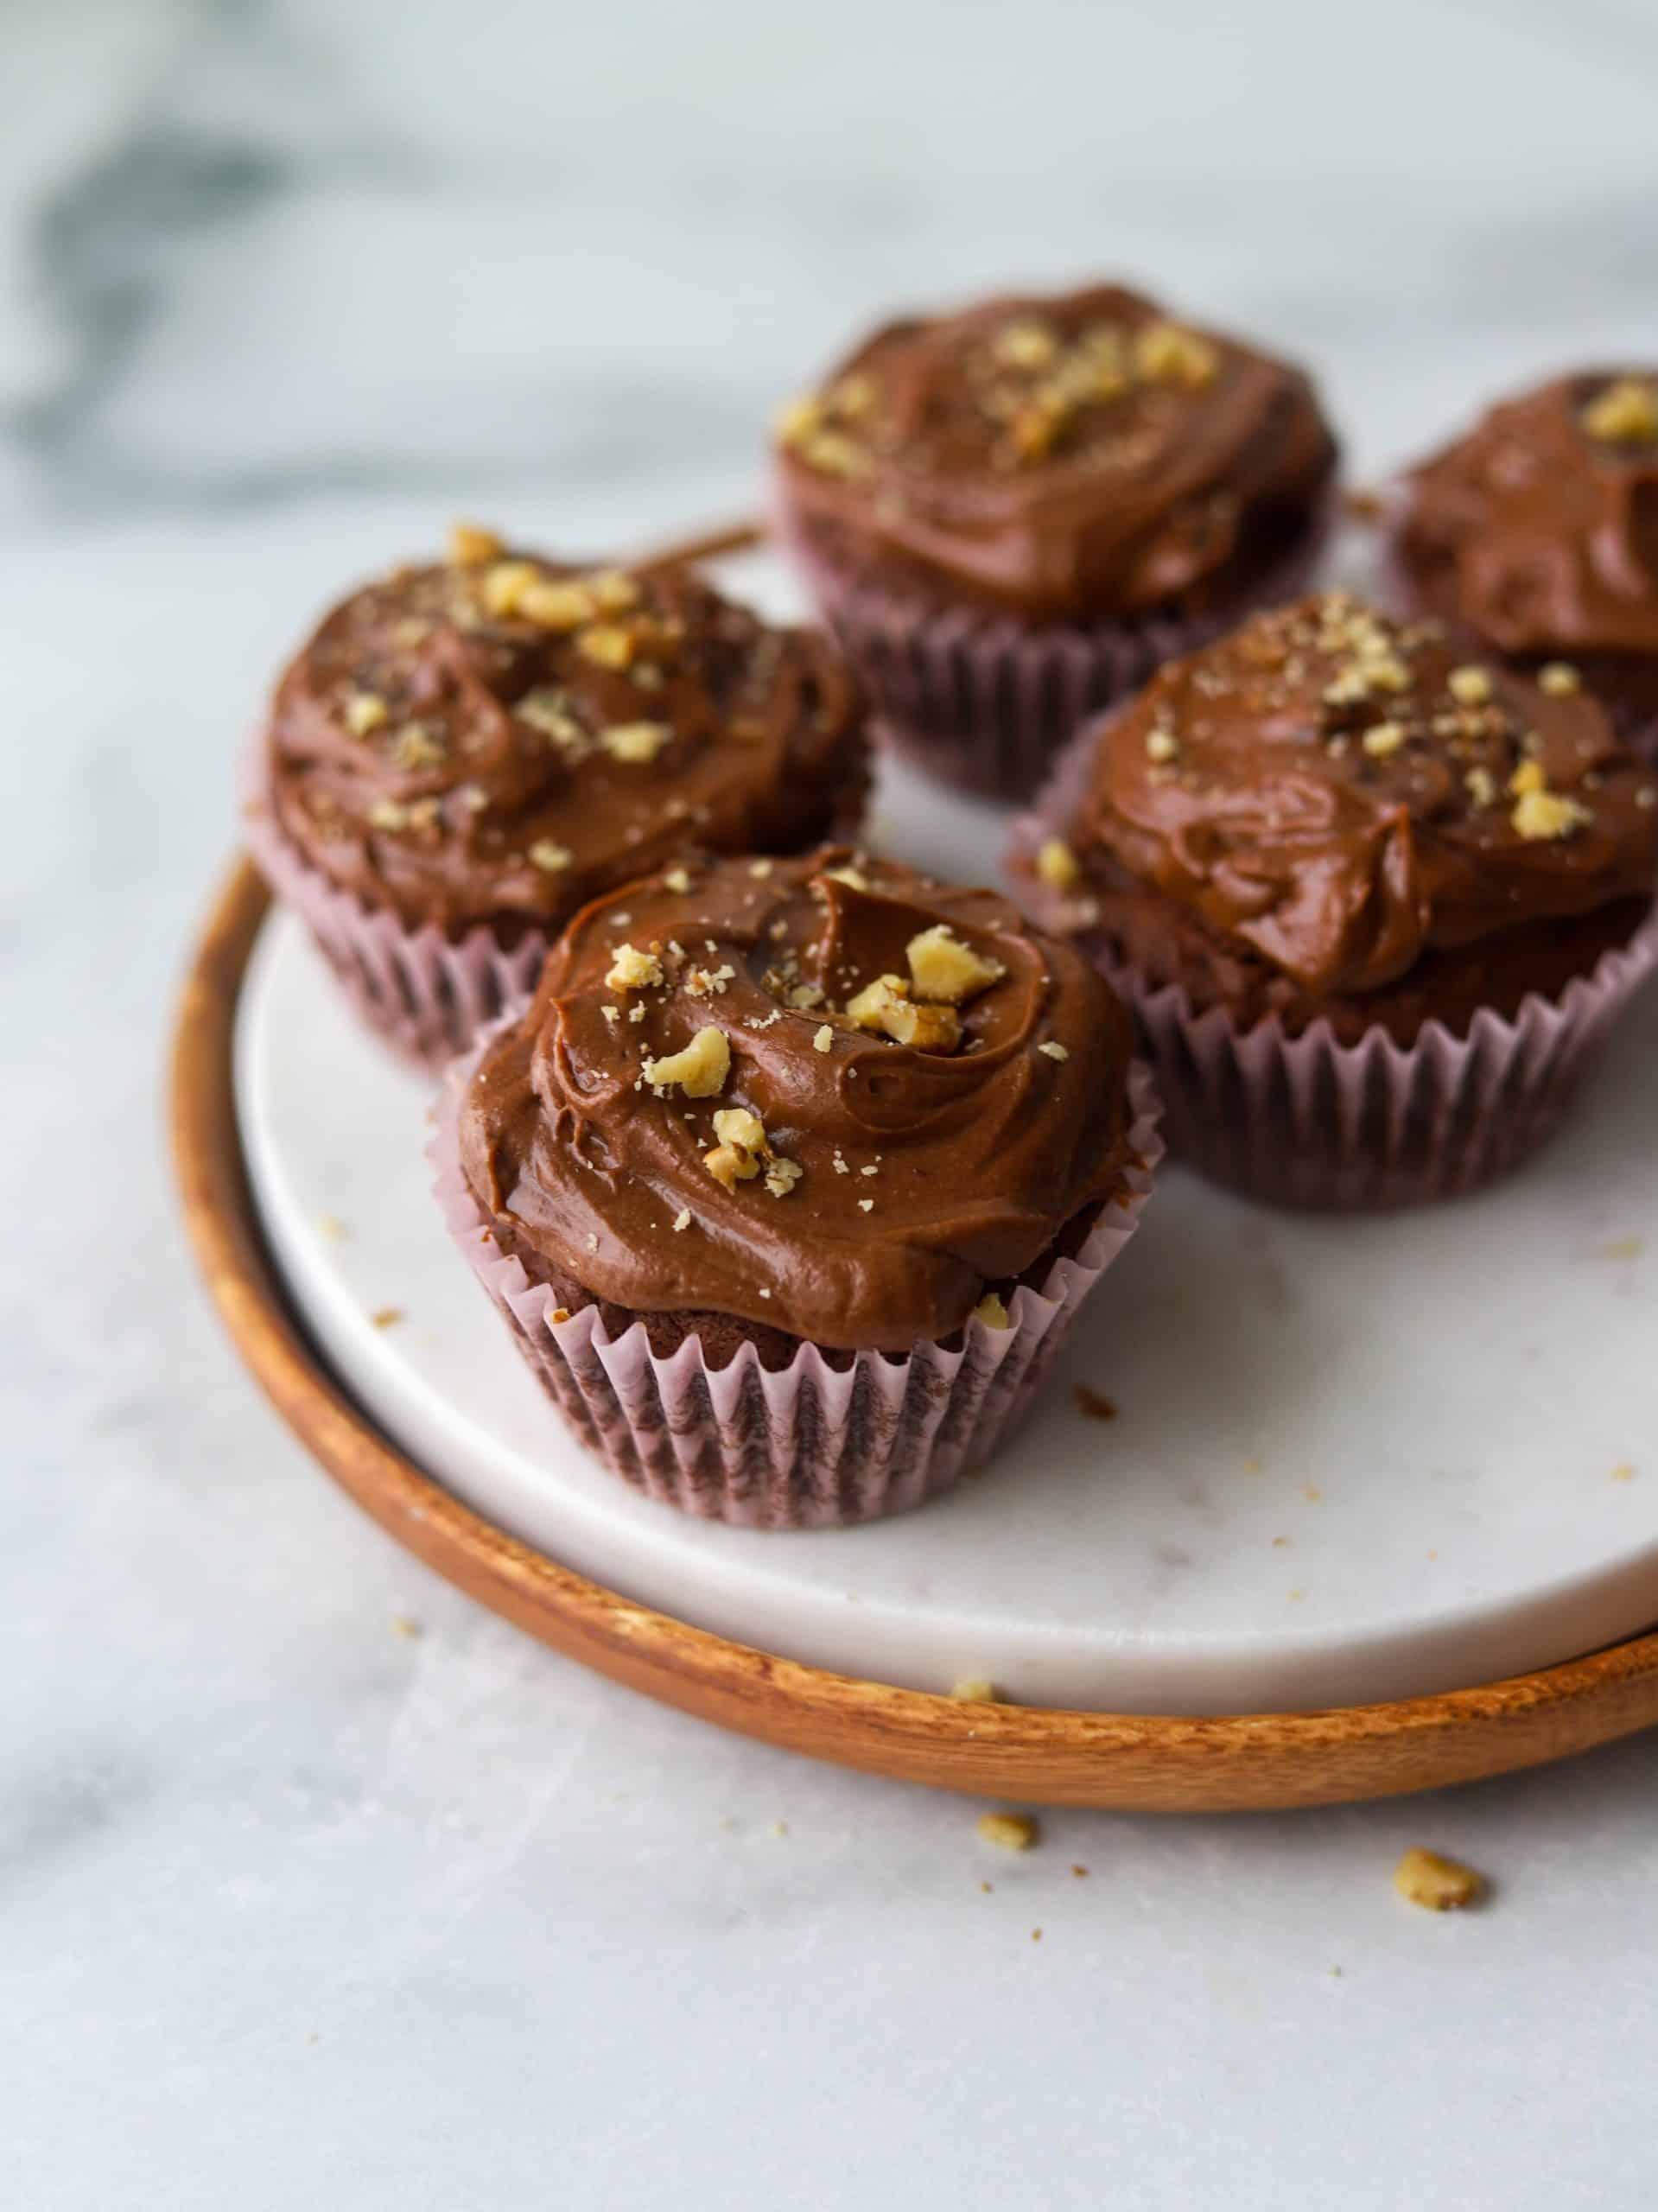 Dark chocolate cupcakes on a marble stone